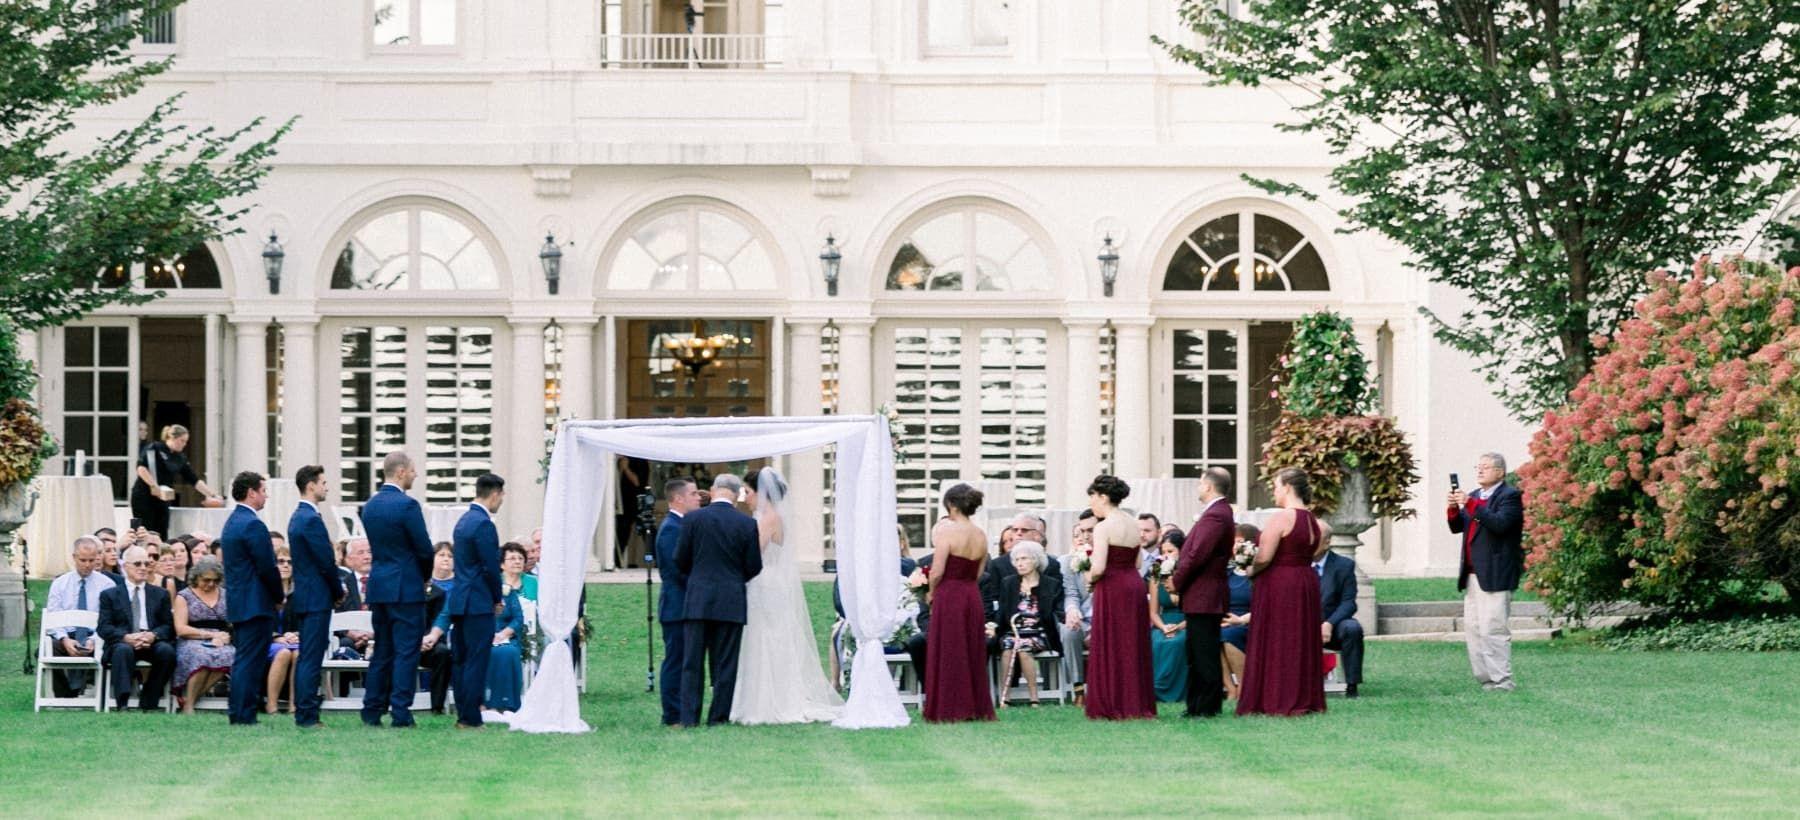 Wedding Venue, Barn Wedding, Wedding Ceremony - Middletown ...